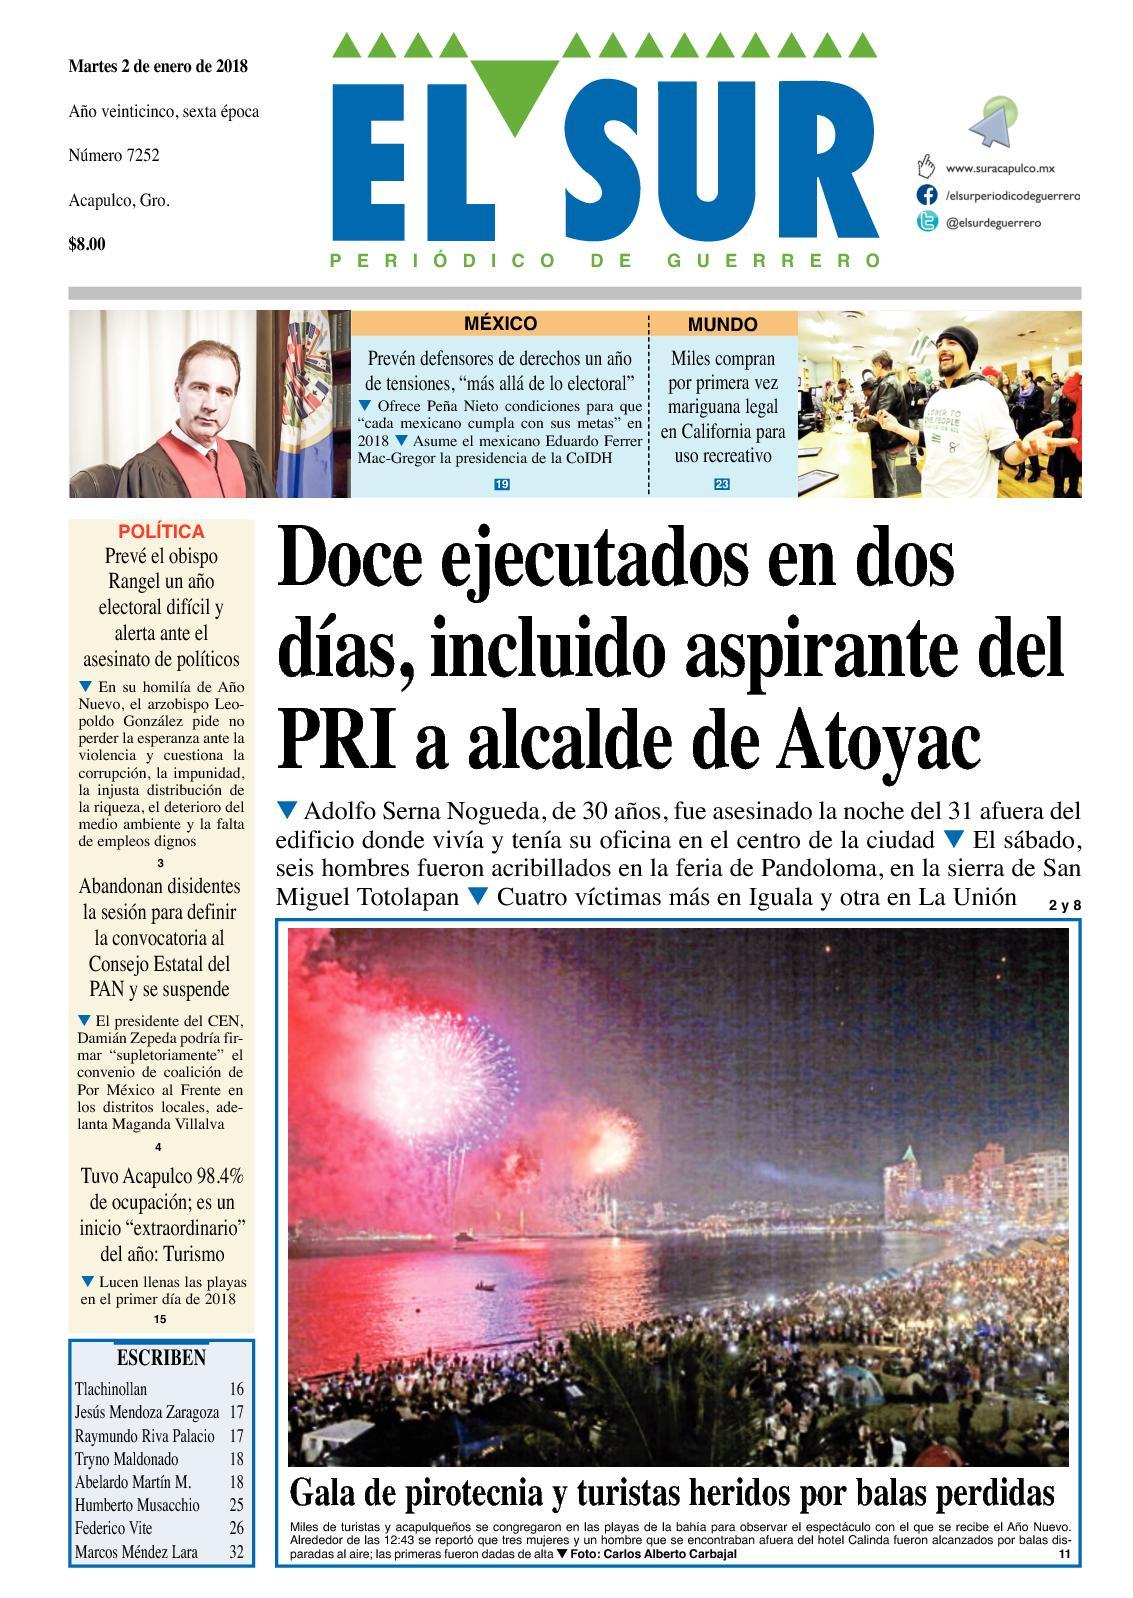 Amaranta Ruiz Culo calam�o - impreso 02012018